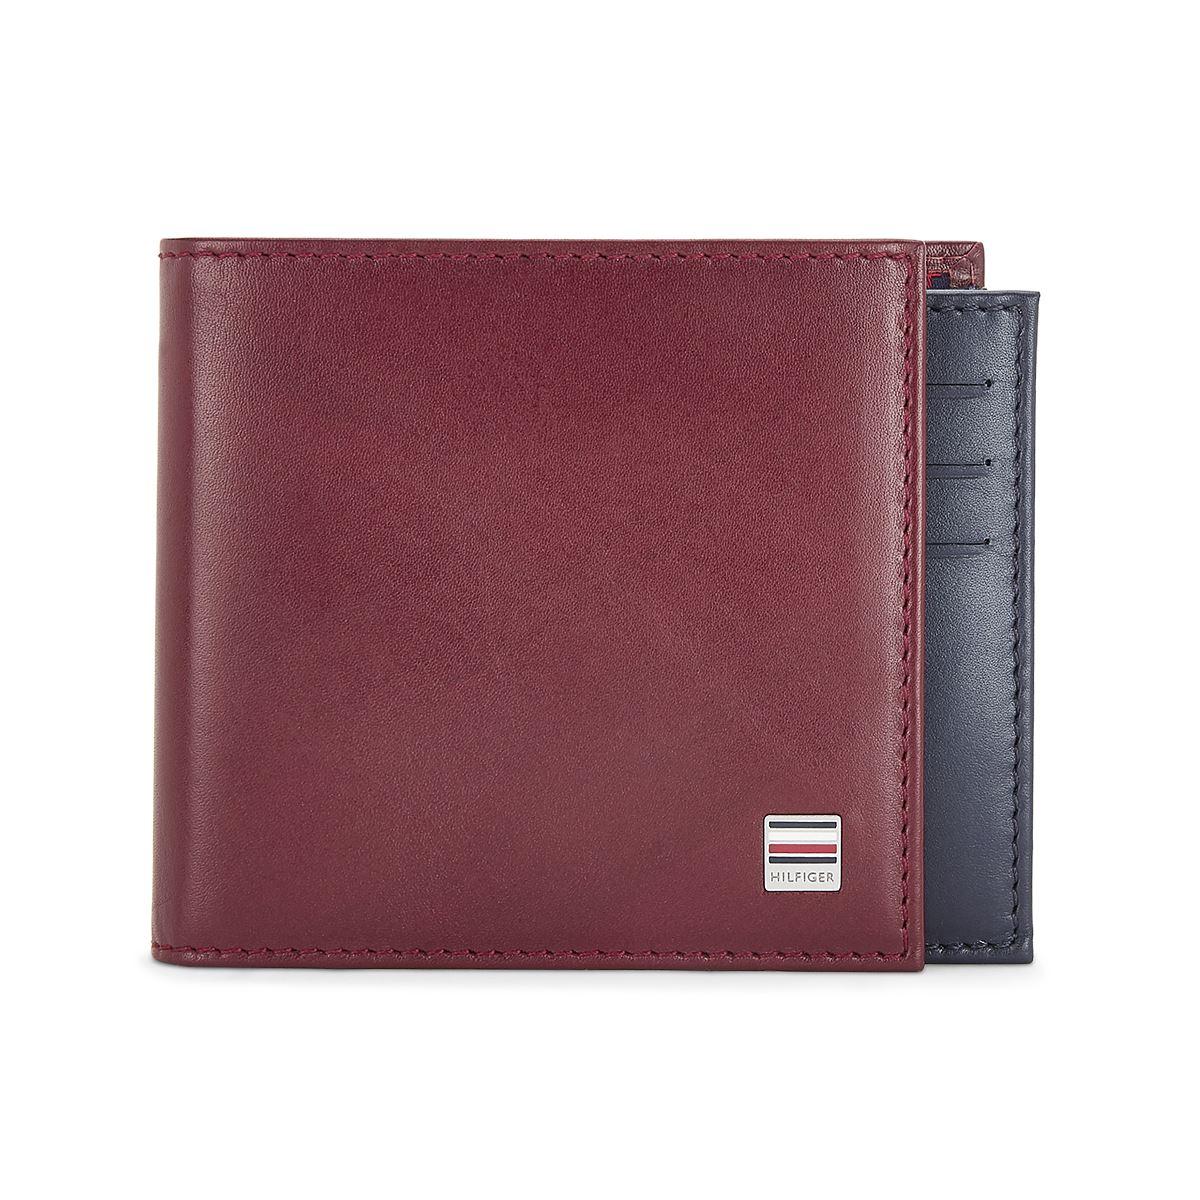 Tommy Hilfiger Leather Mens Solid Wine/Navy Insider Slimfold Wallet